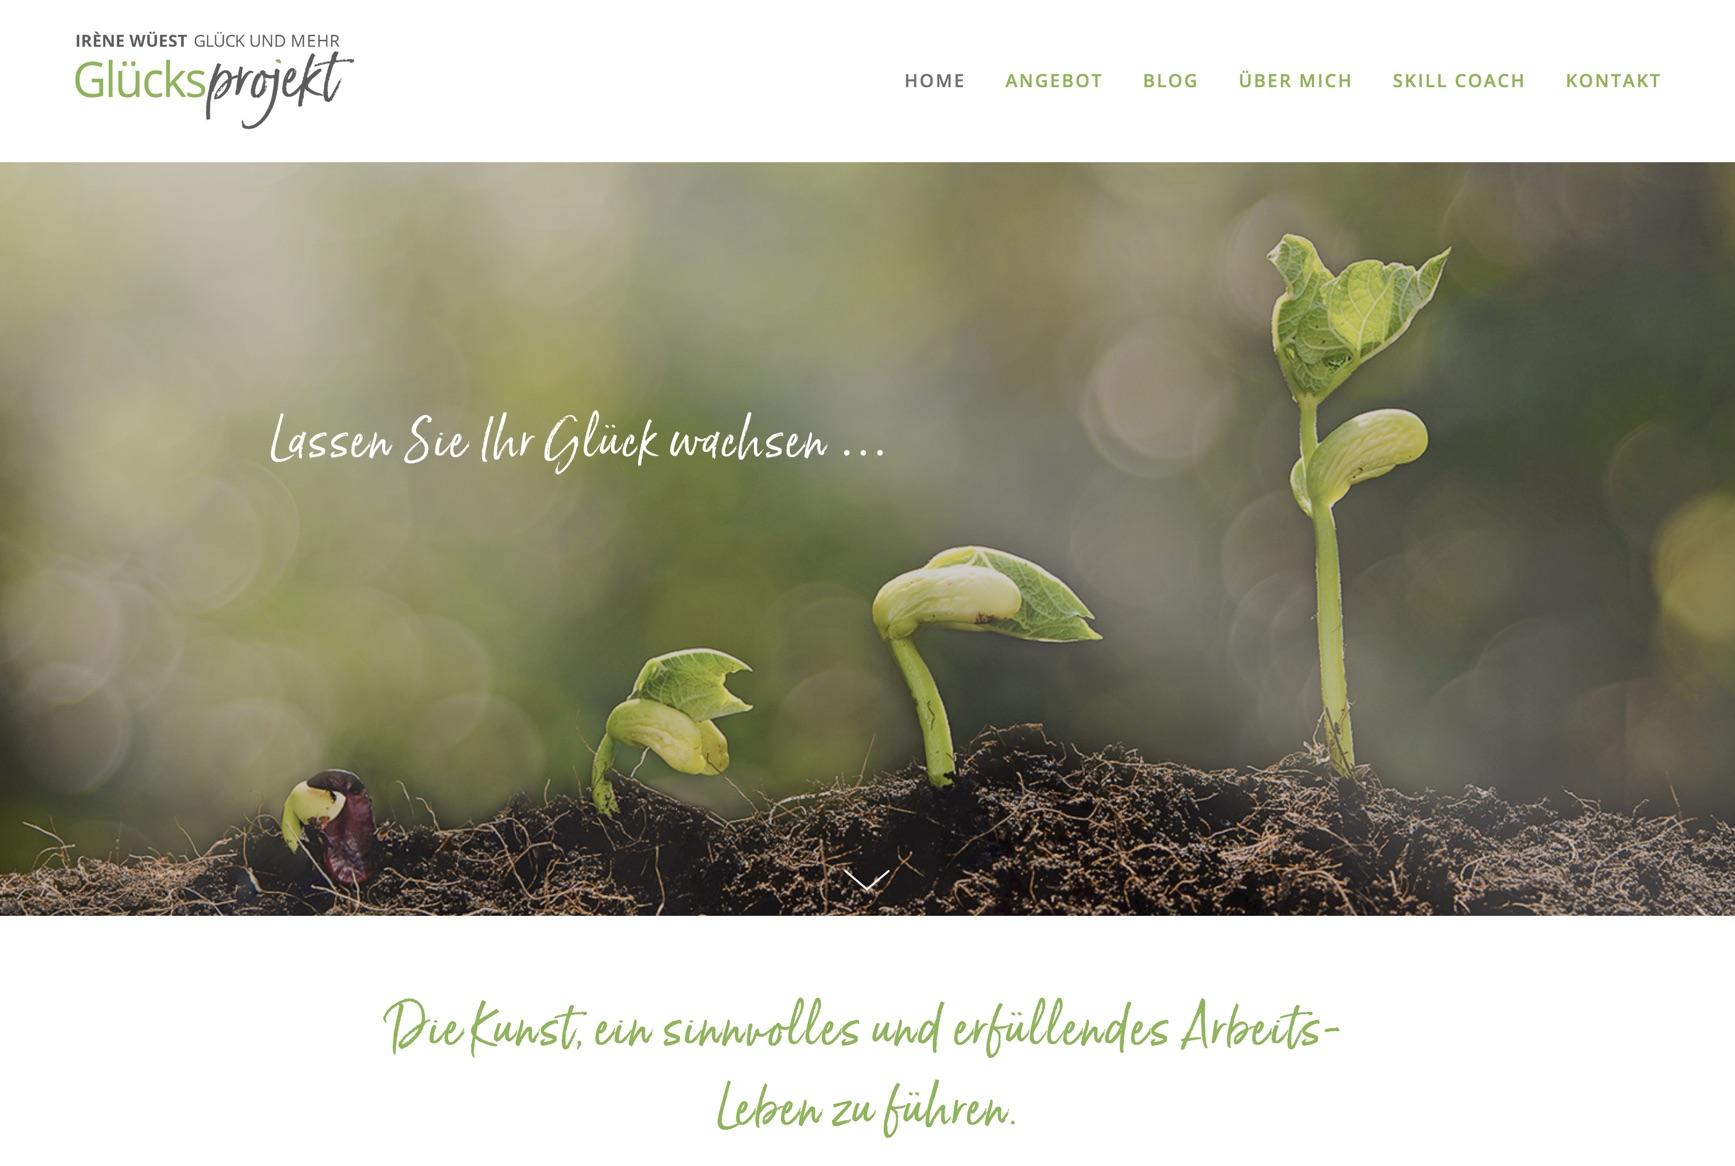 www.gluecksprojekt.ch - Webdesign & Portraits